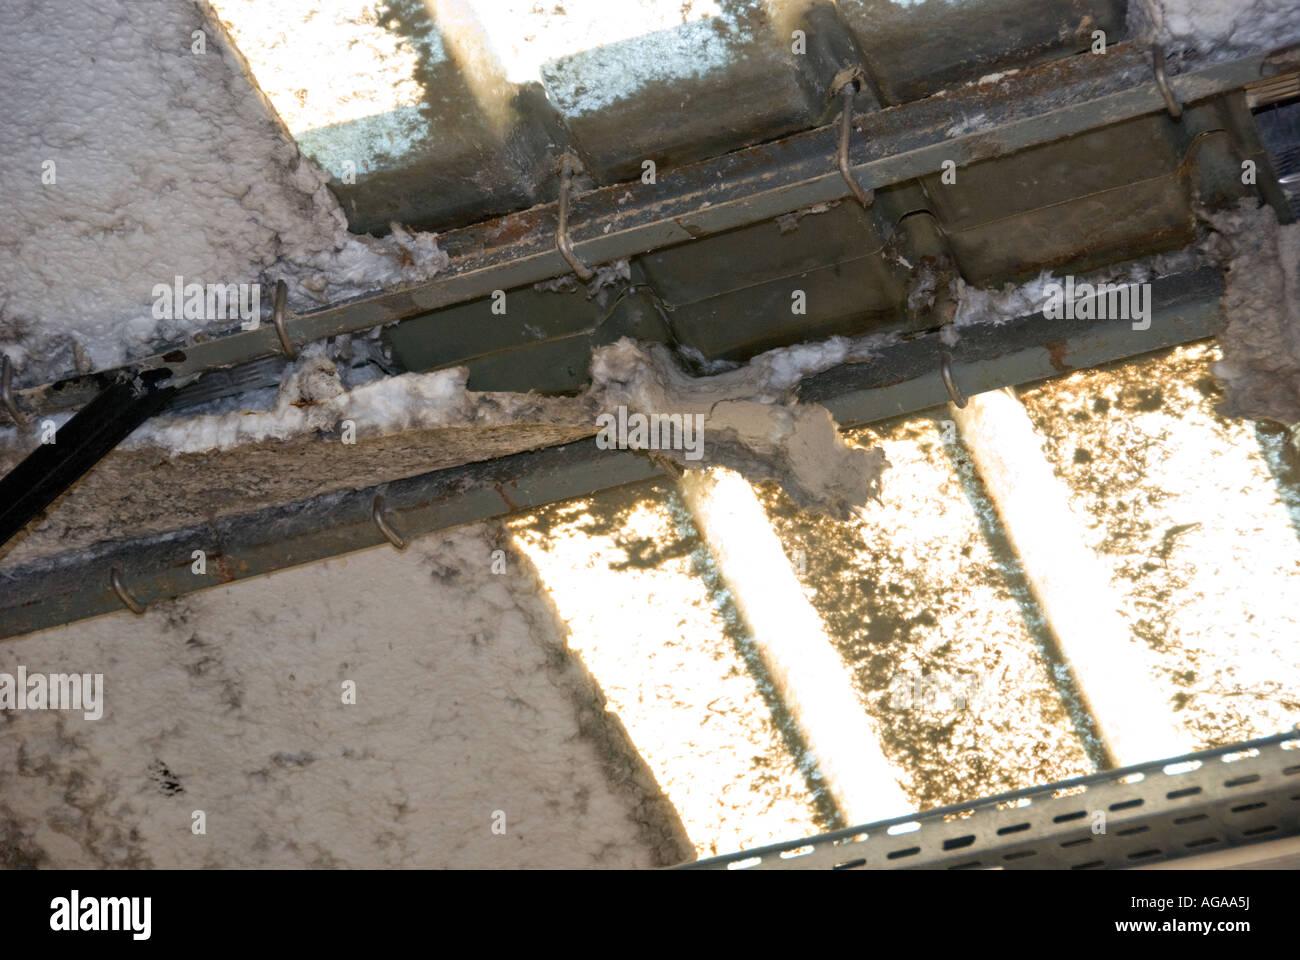 Disintegration Of Asbestos Insulated Roof